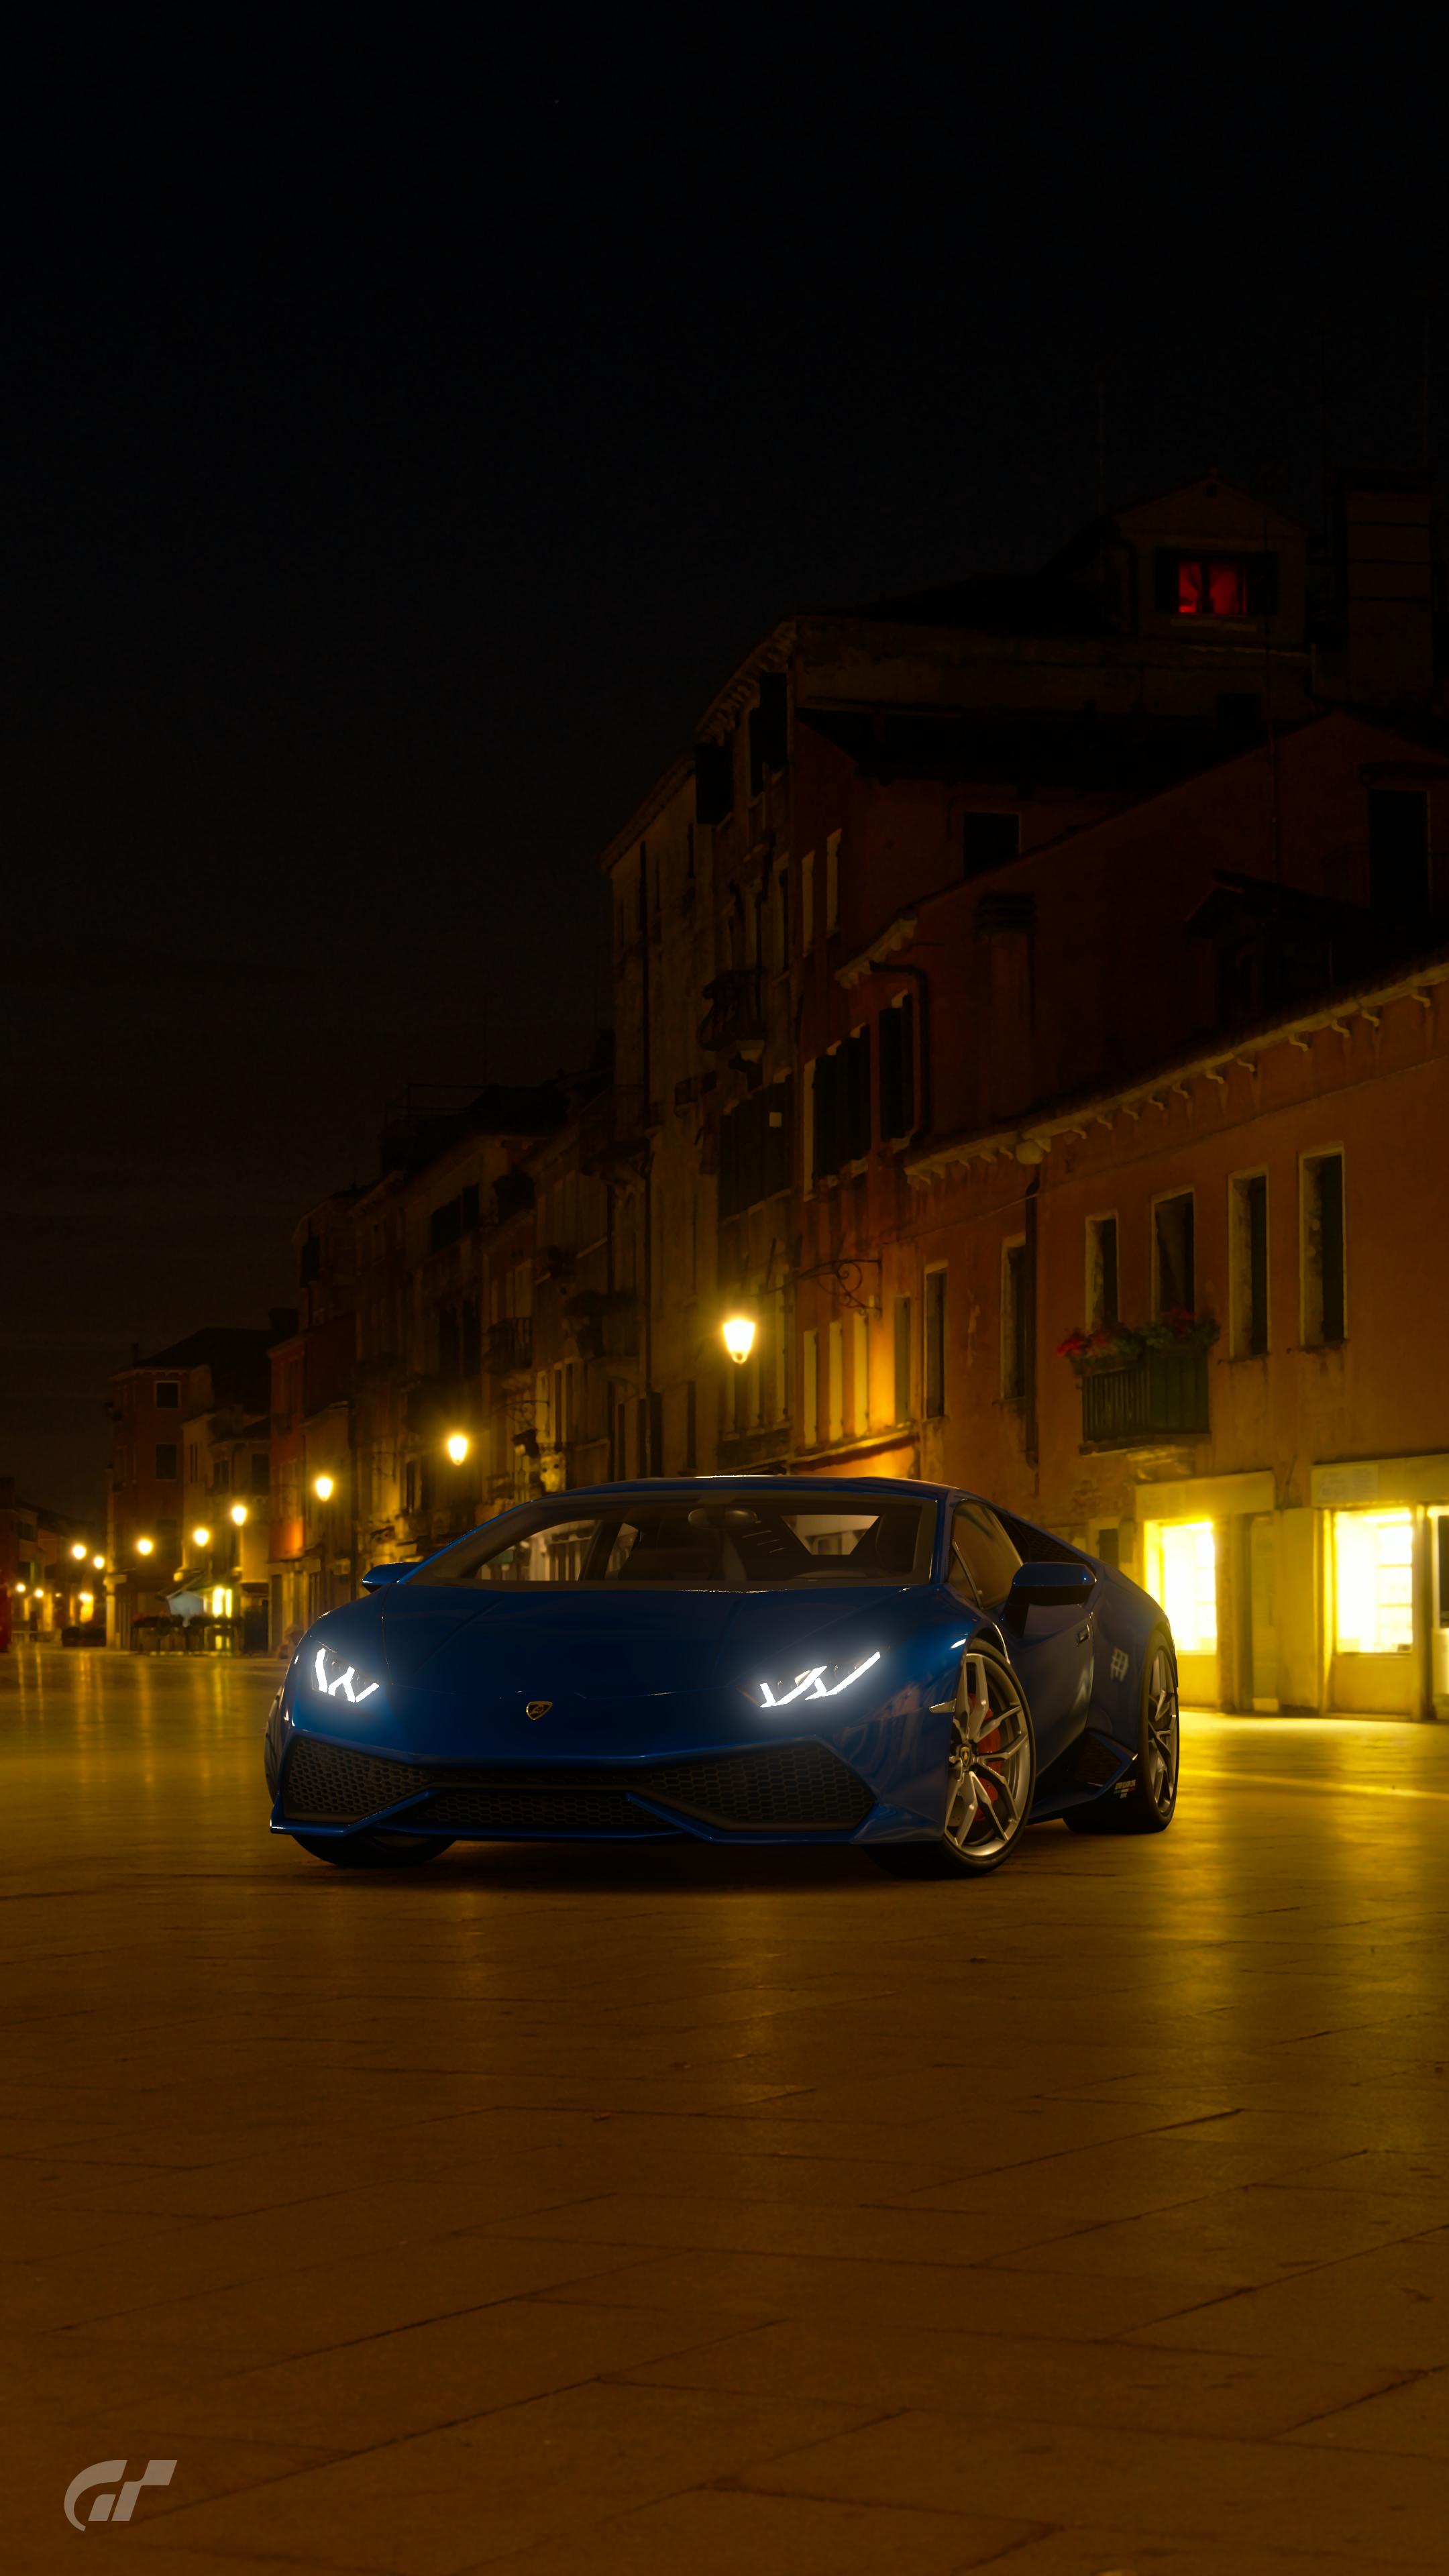 Iphone X Wallpaper - Lamborghini Gallardo , HD Wallpaper & Backgrounds